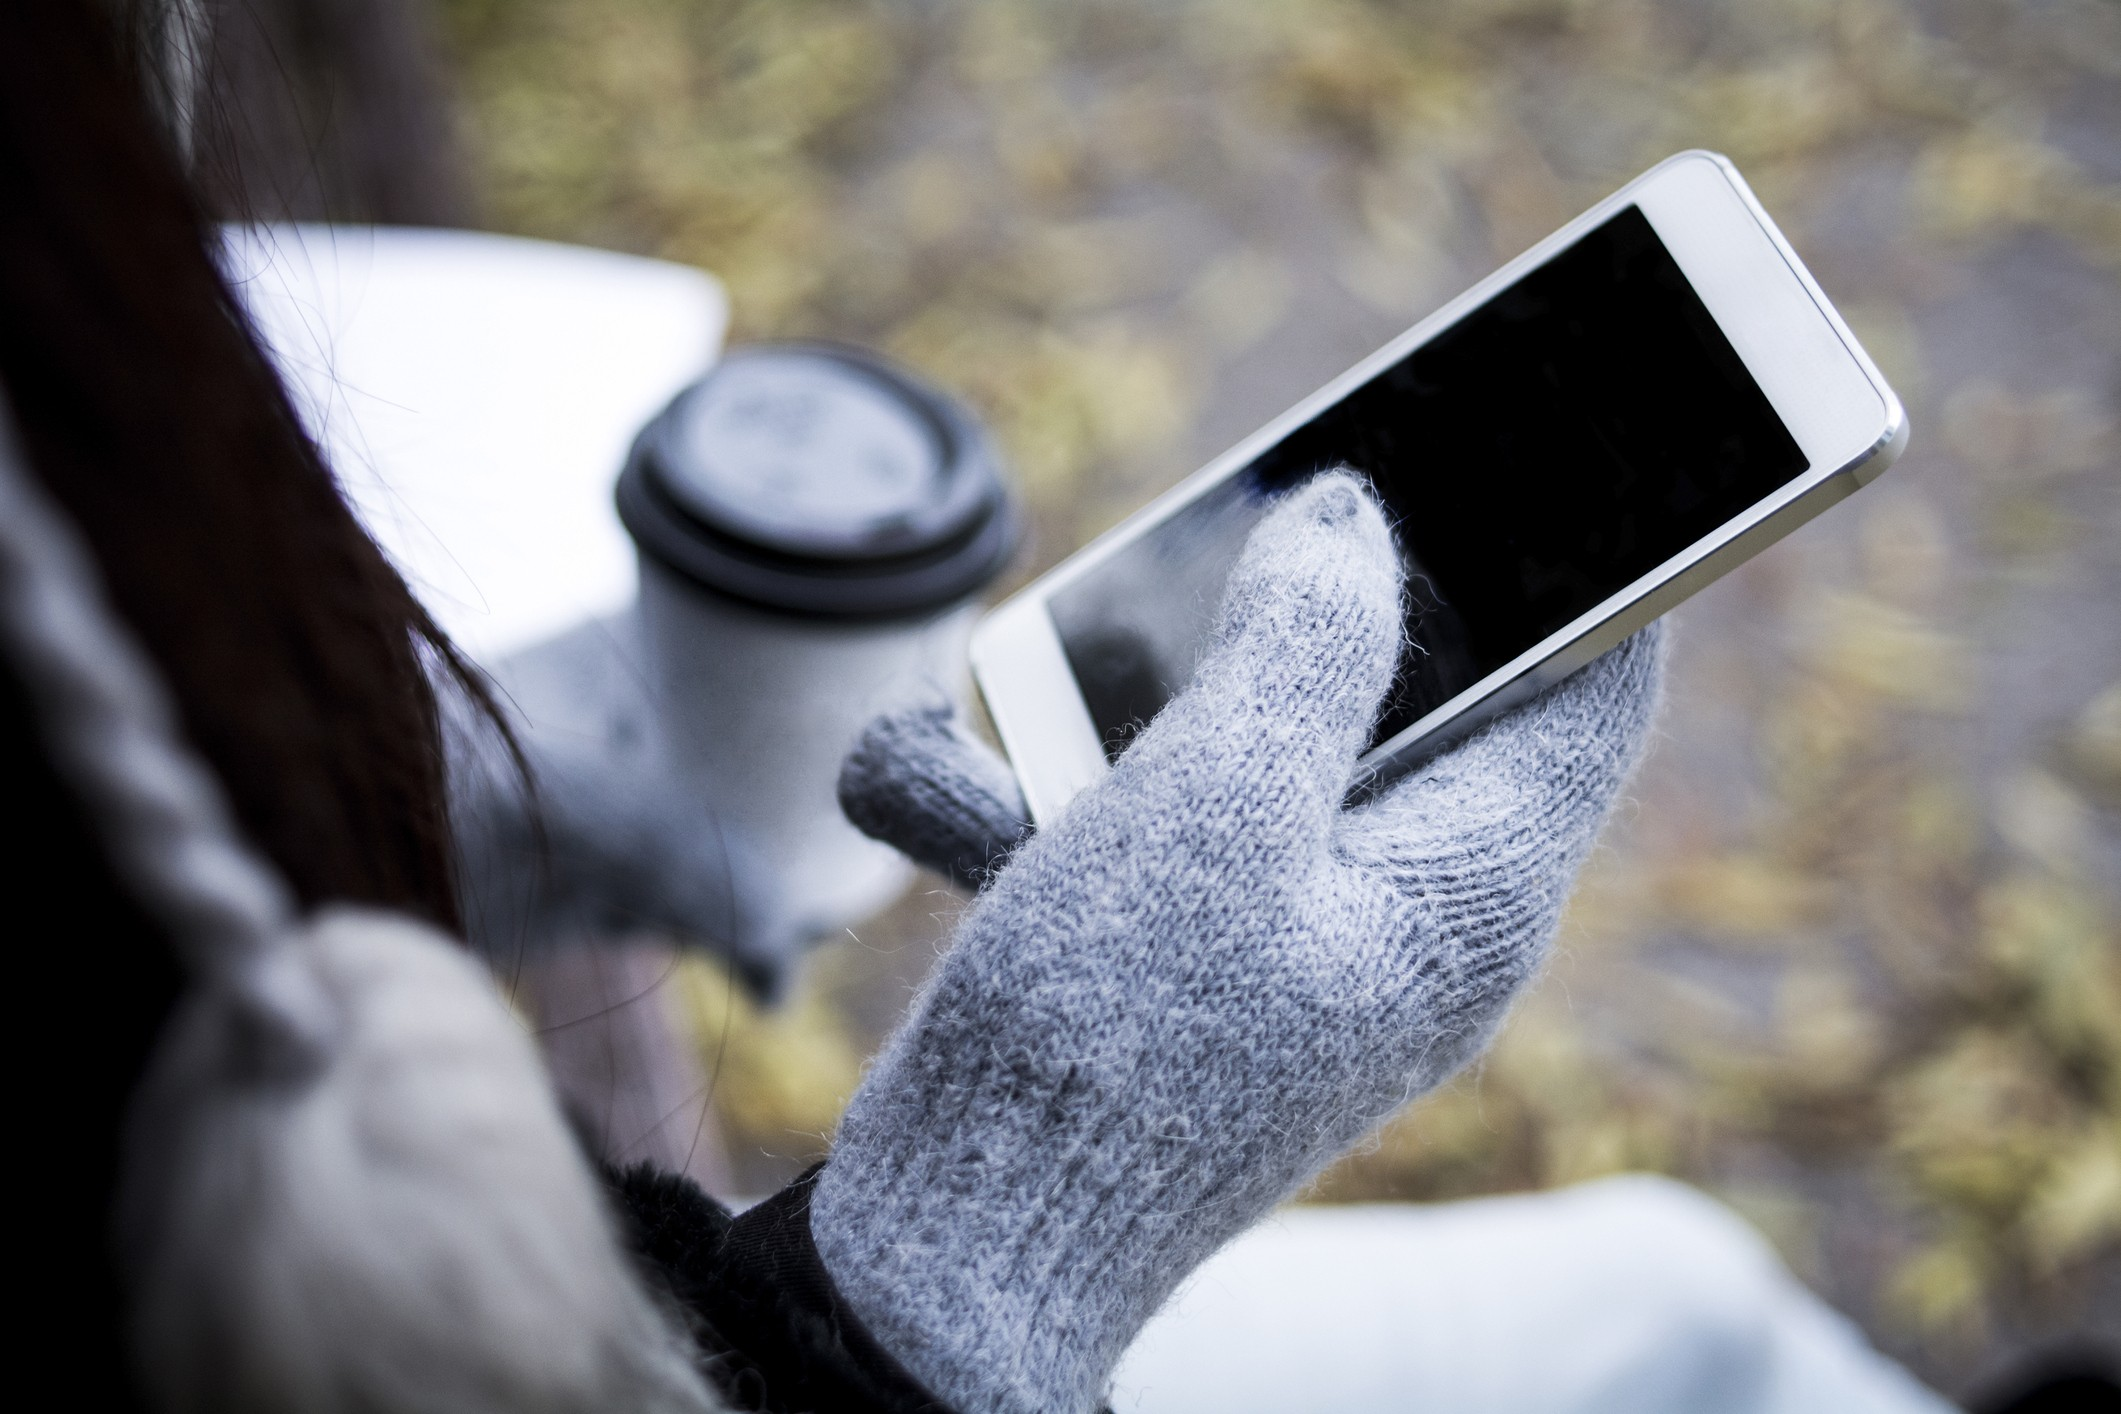 hand wearing glove holding smartphone